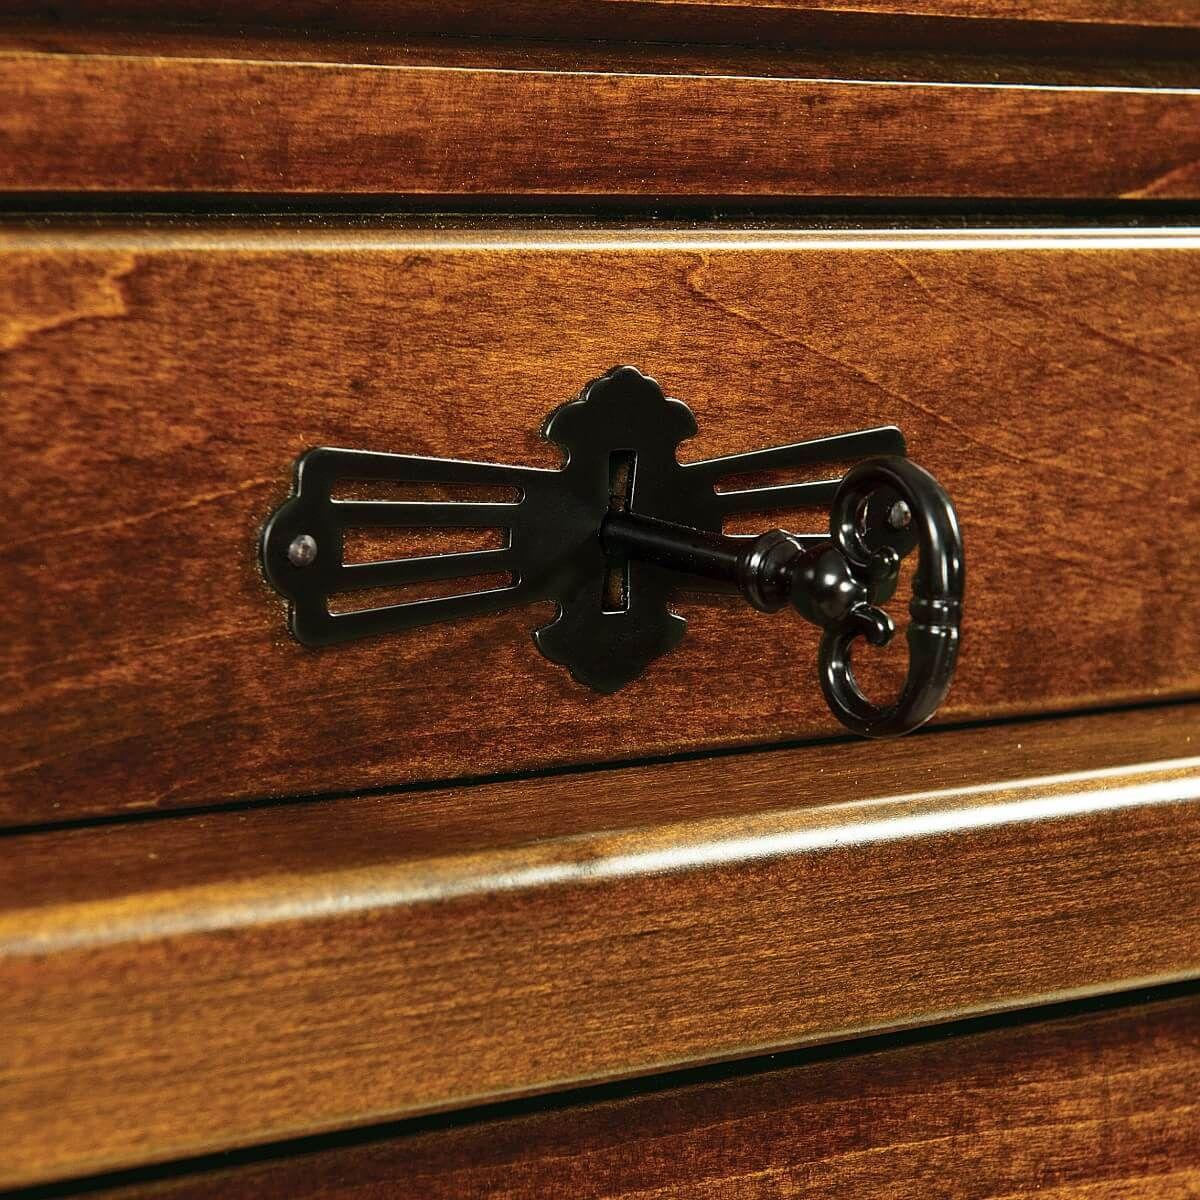 Keyed Tambour Lock on Roll Top Desk